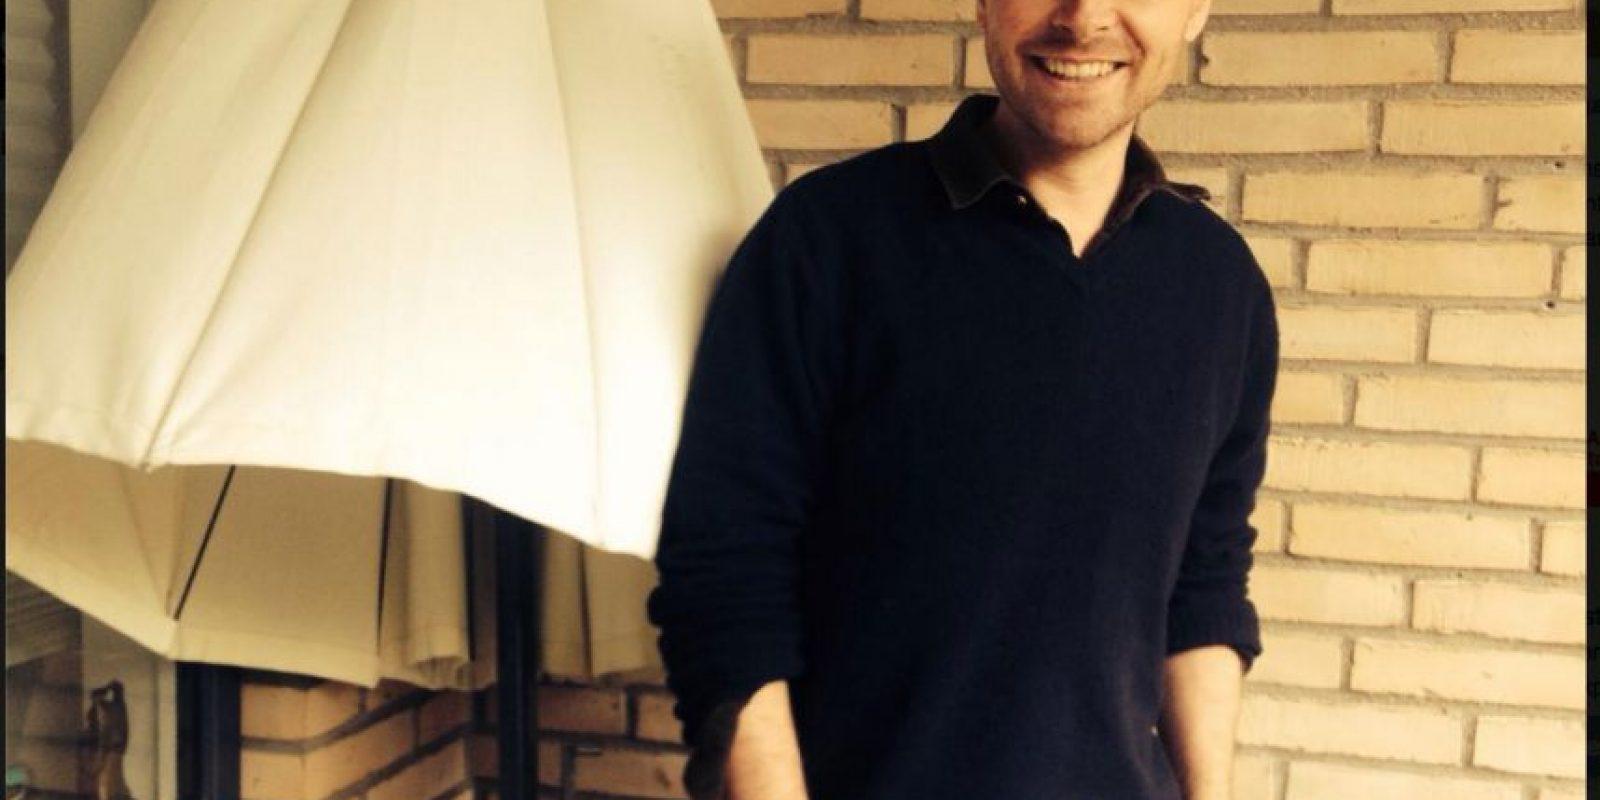 Asger Juhl, uno de los presentadores, que mató al animal. Foto:Vía Facebook.com/AsgerJuhl